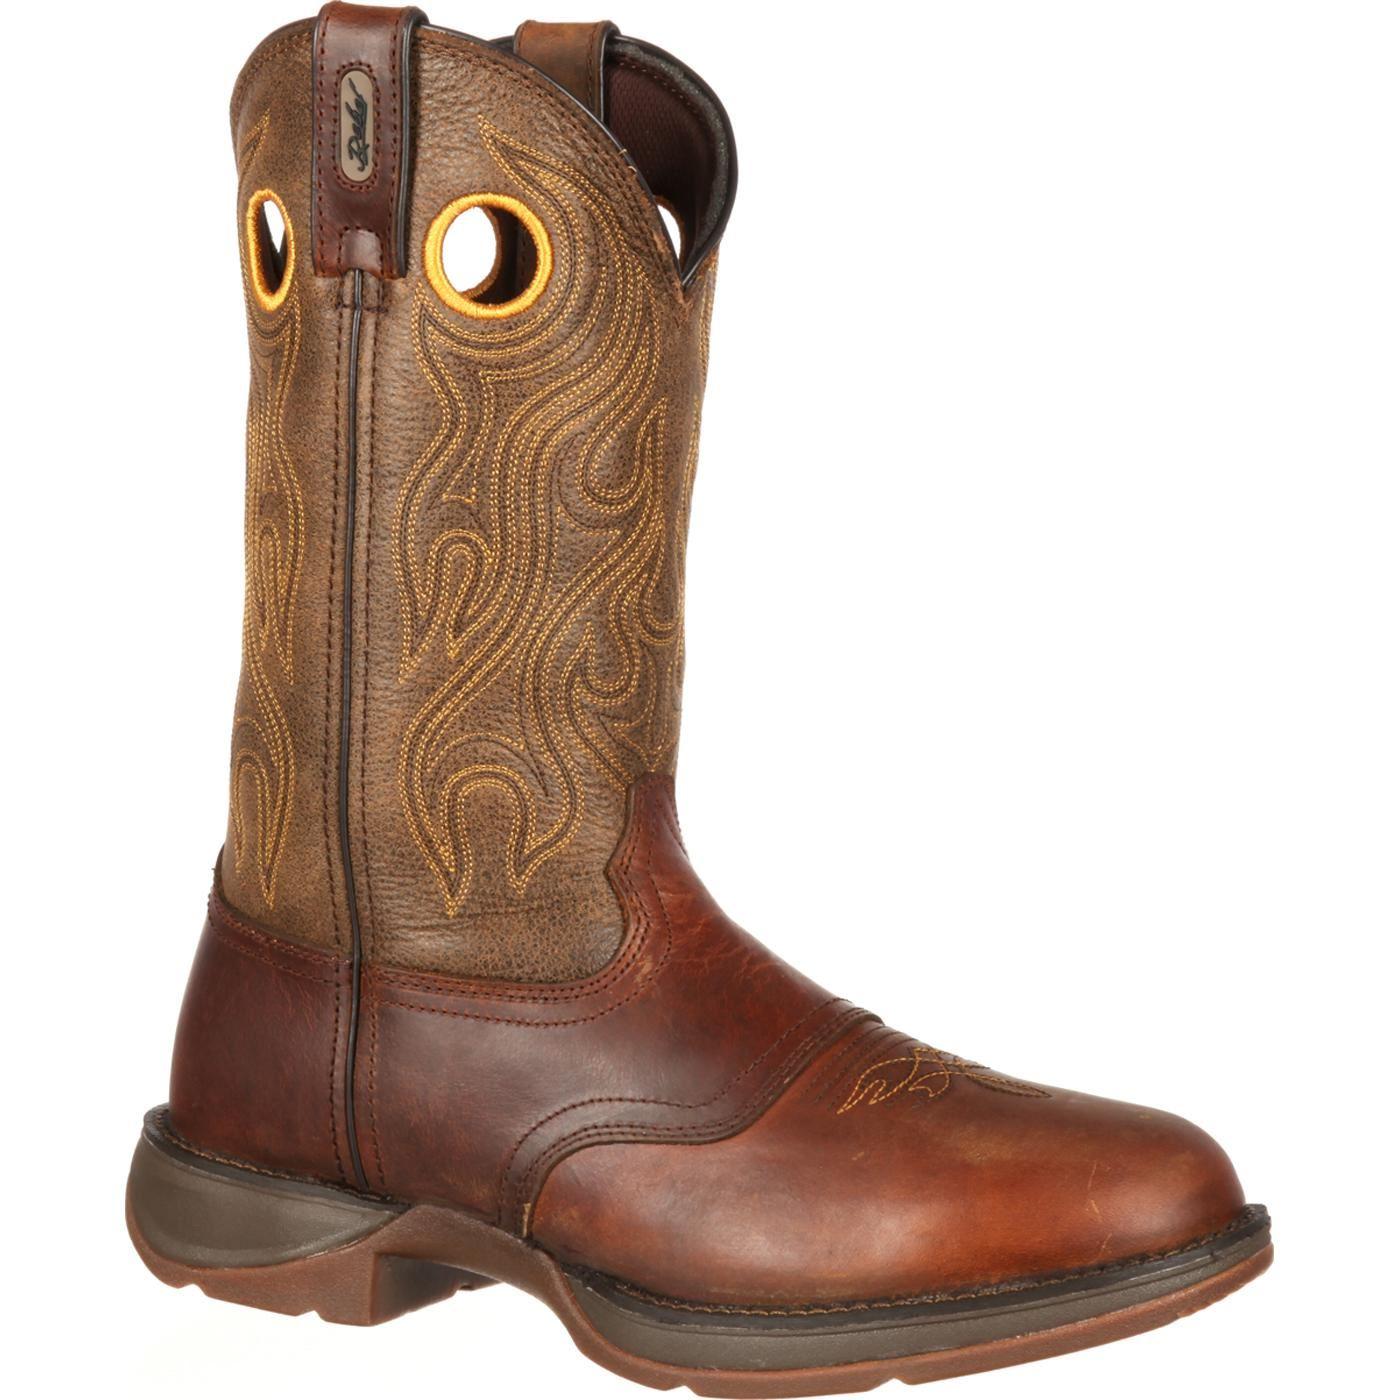 Rebel by Durango Men's Brown Saddle Western Boot